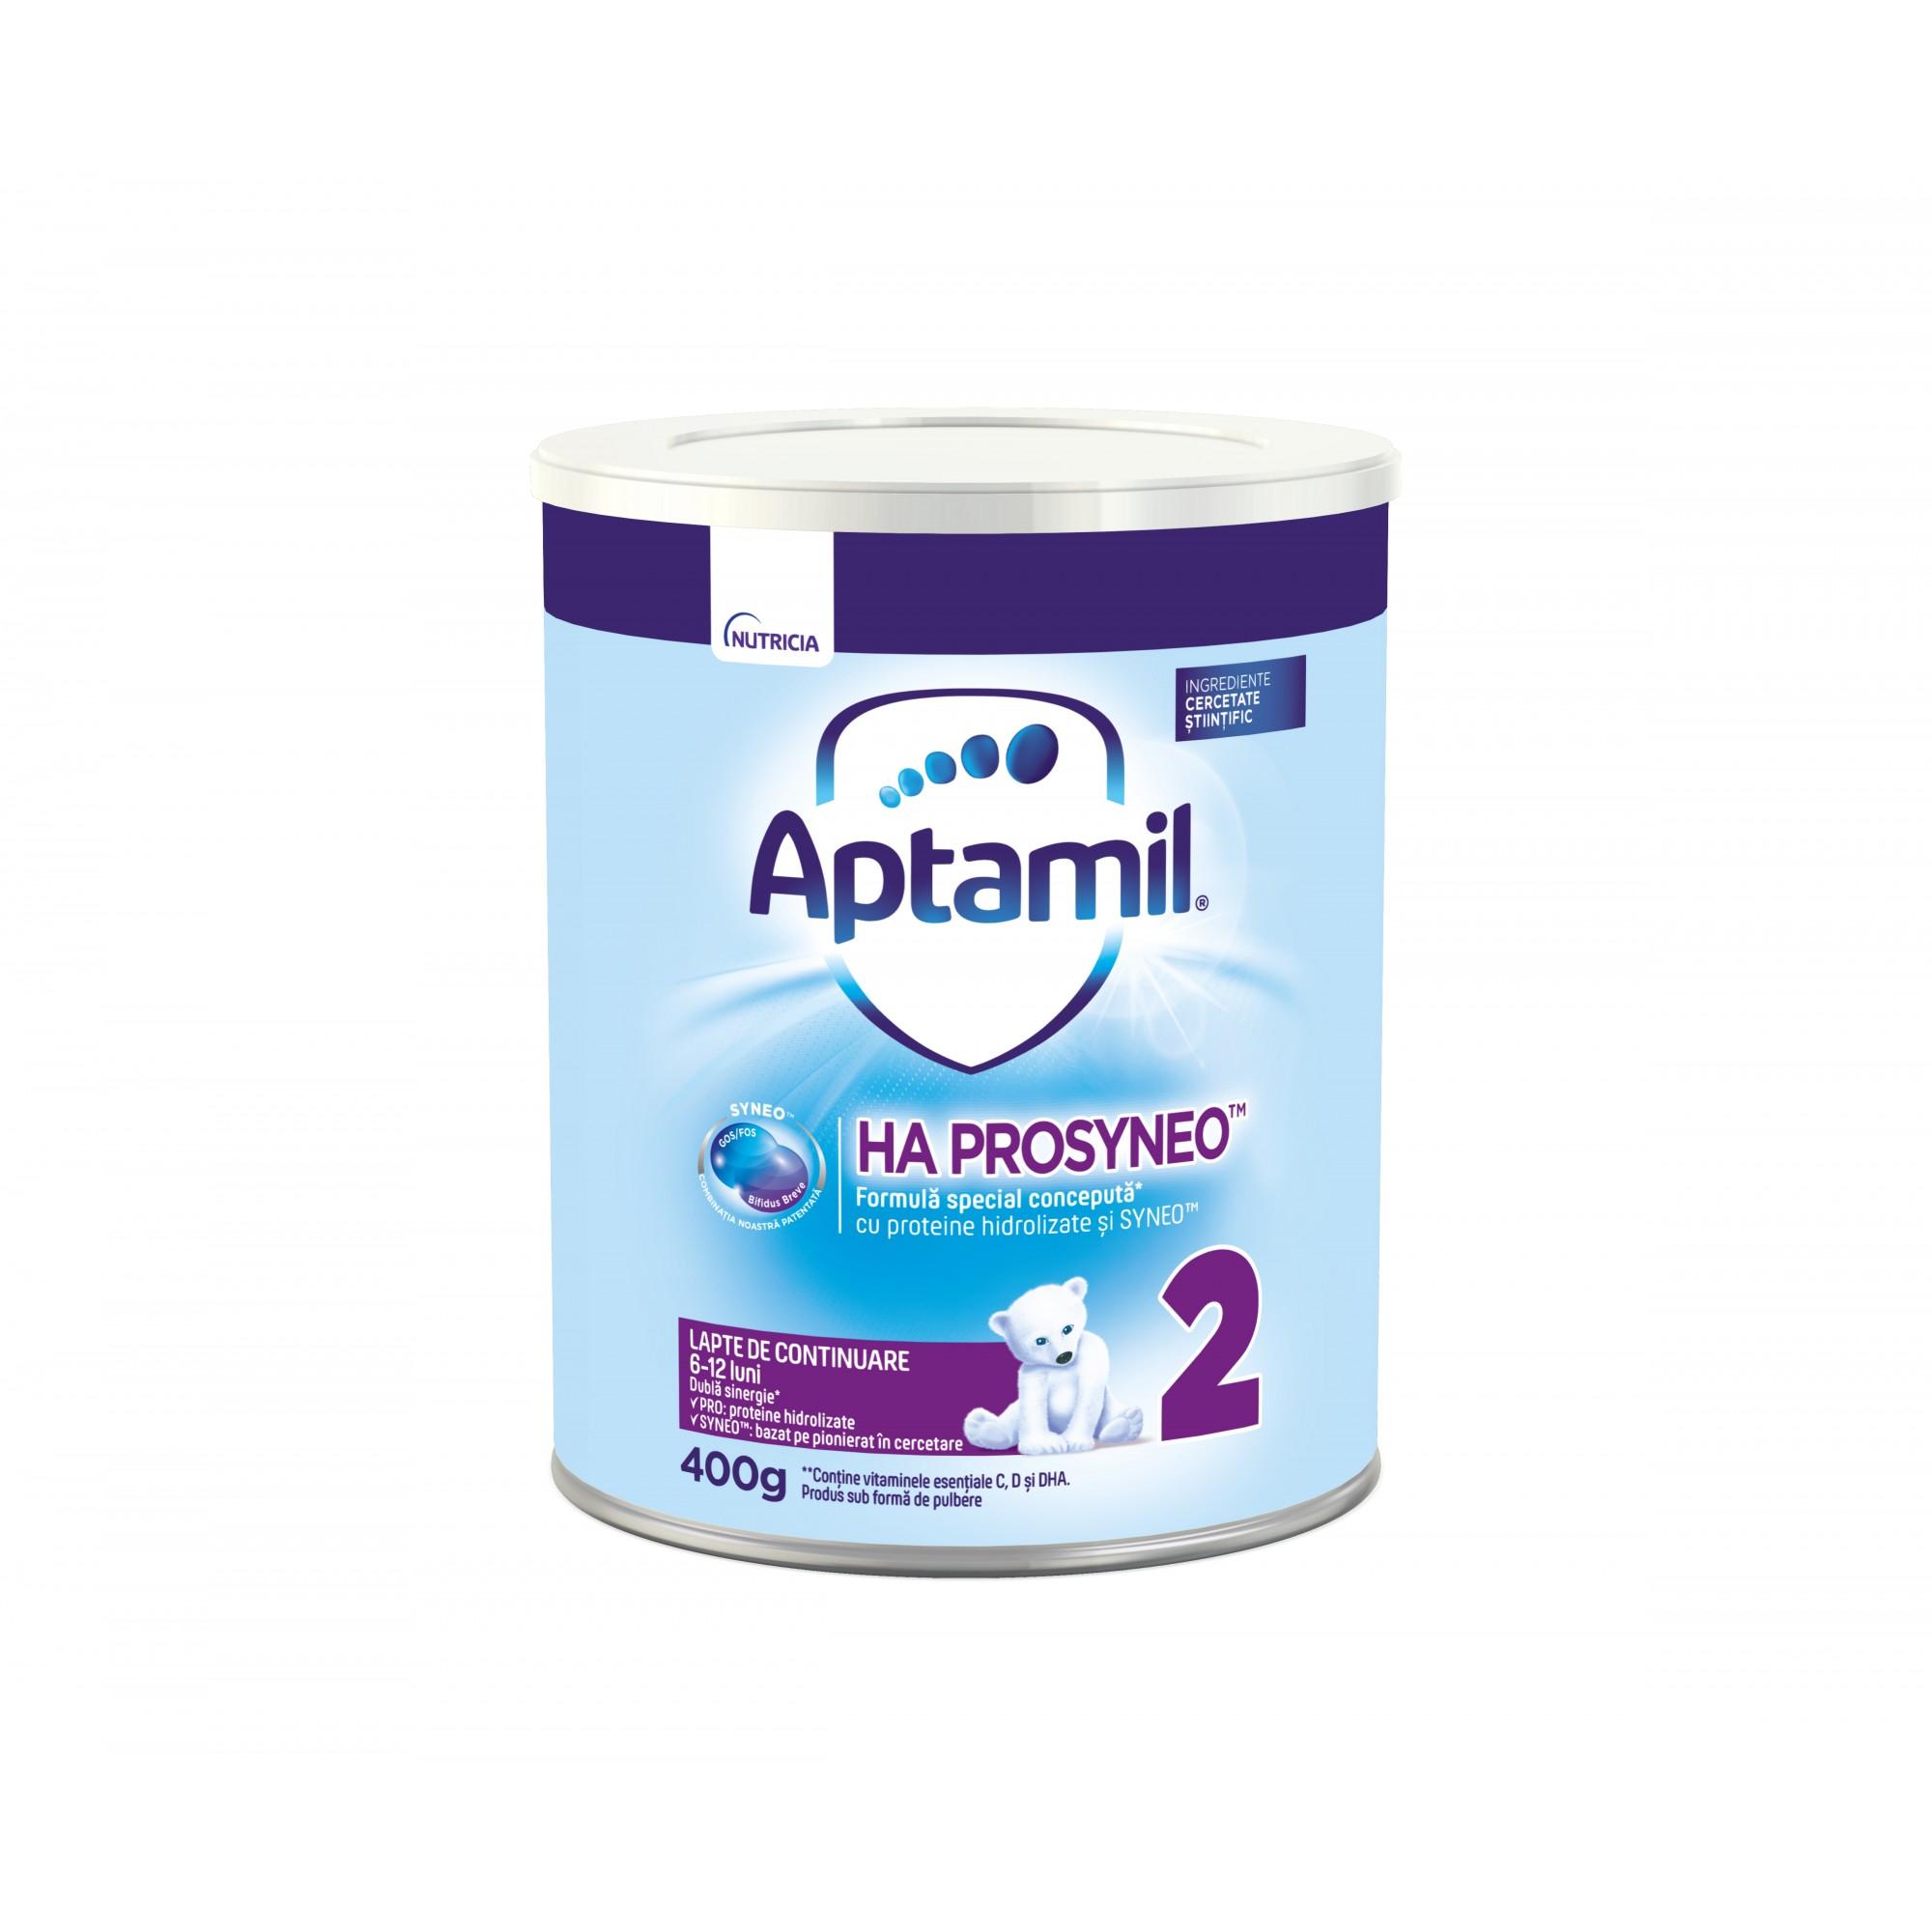 Lapte de inceput Nutricia, Aptamil HA2 Prosyneo, 400g